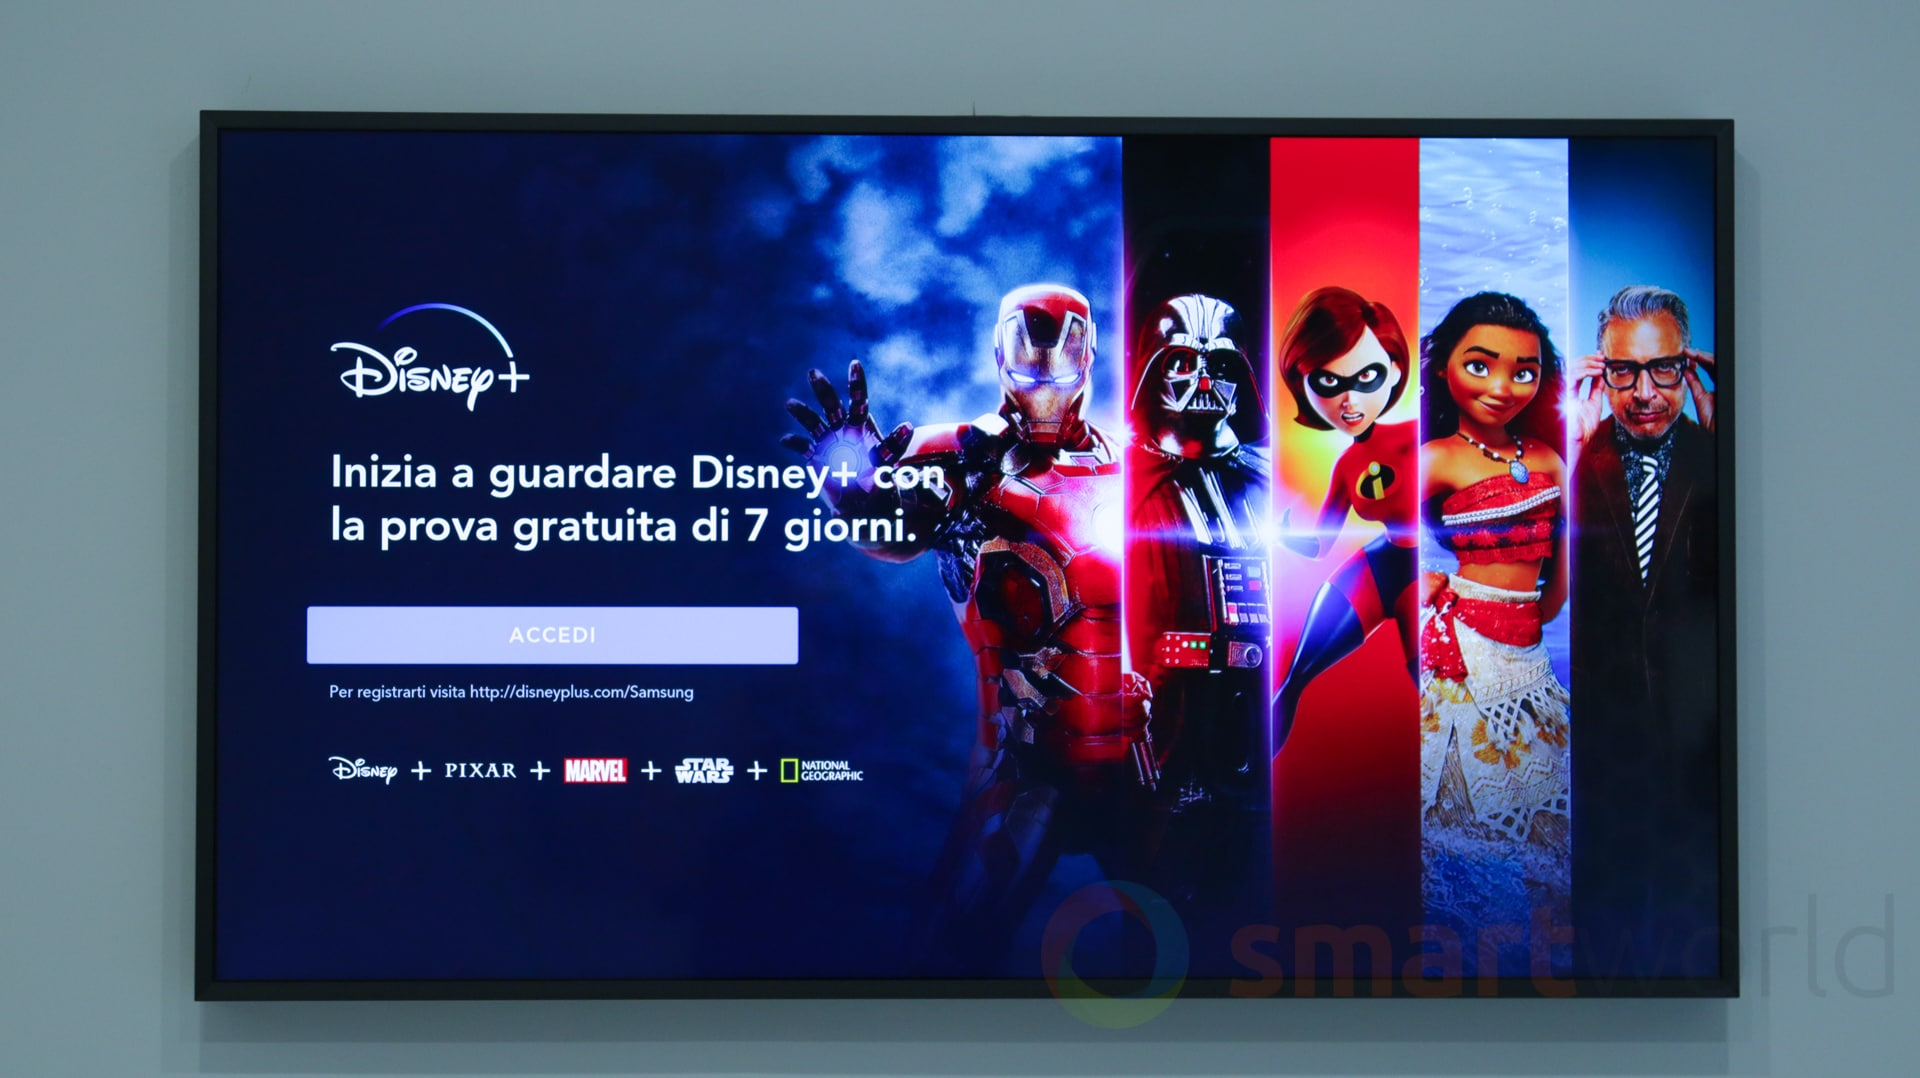 disney plus italia disponibile prova smart tv-2